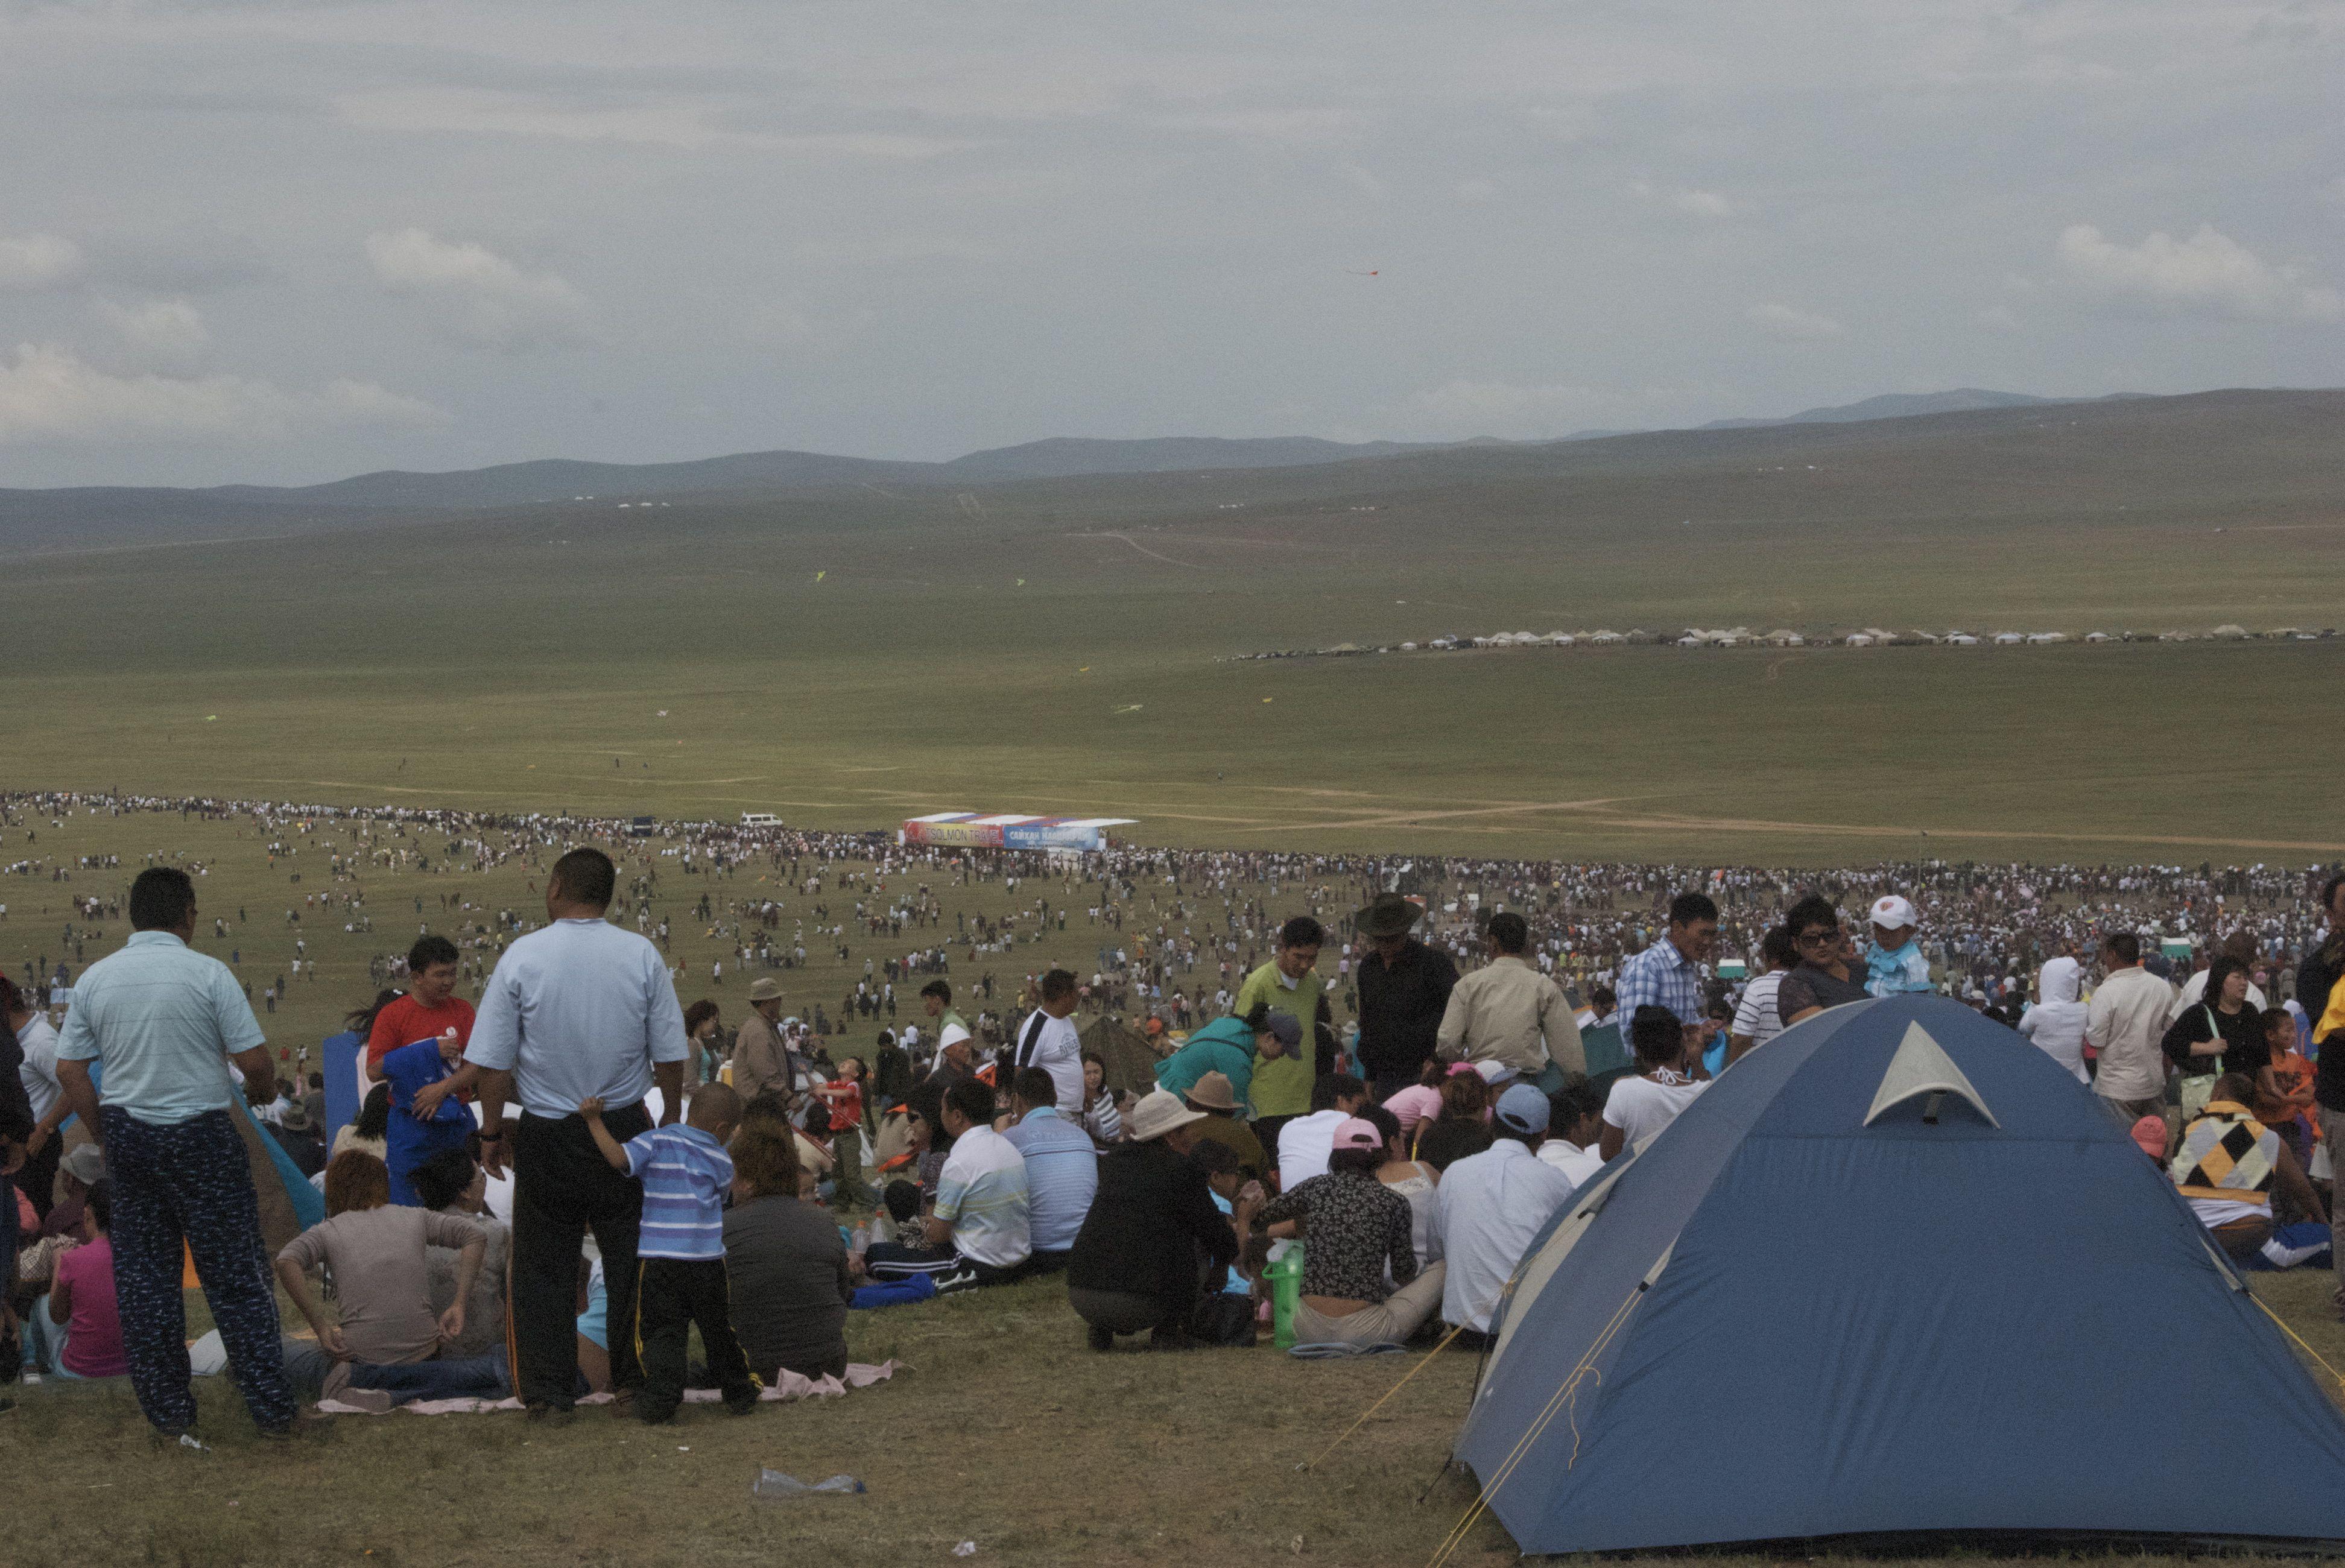 Horse race crowd